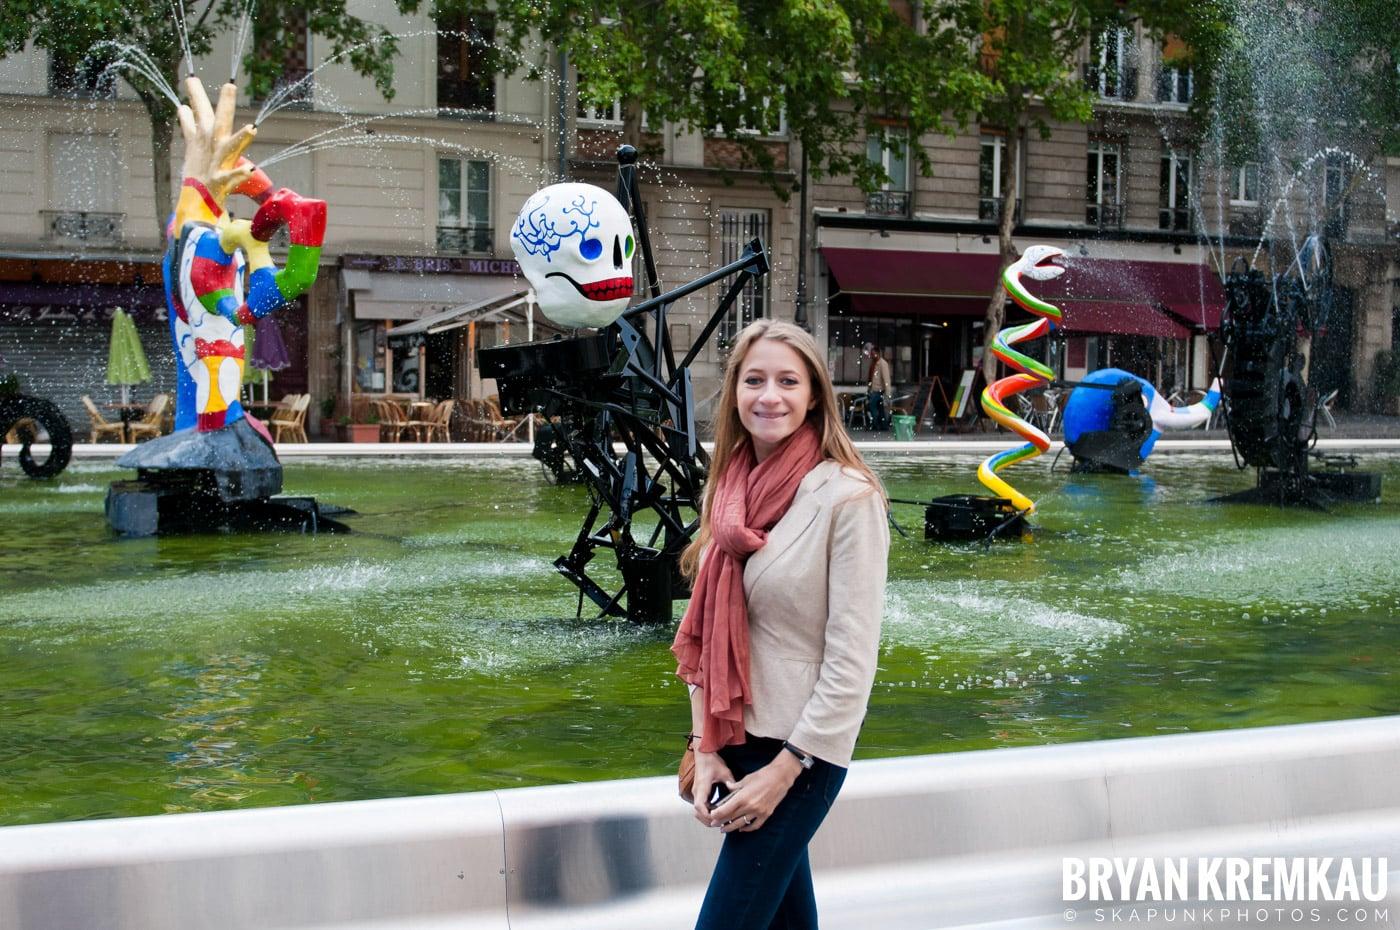 Paris, France Honeymoon - Day 5 - 7.22.11 (58)